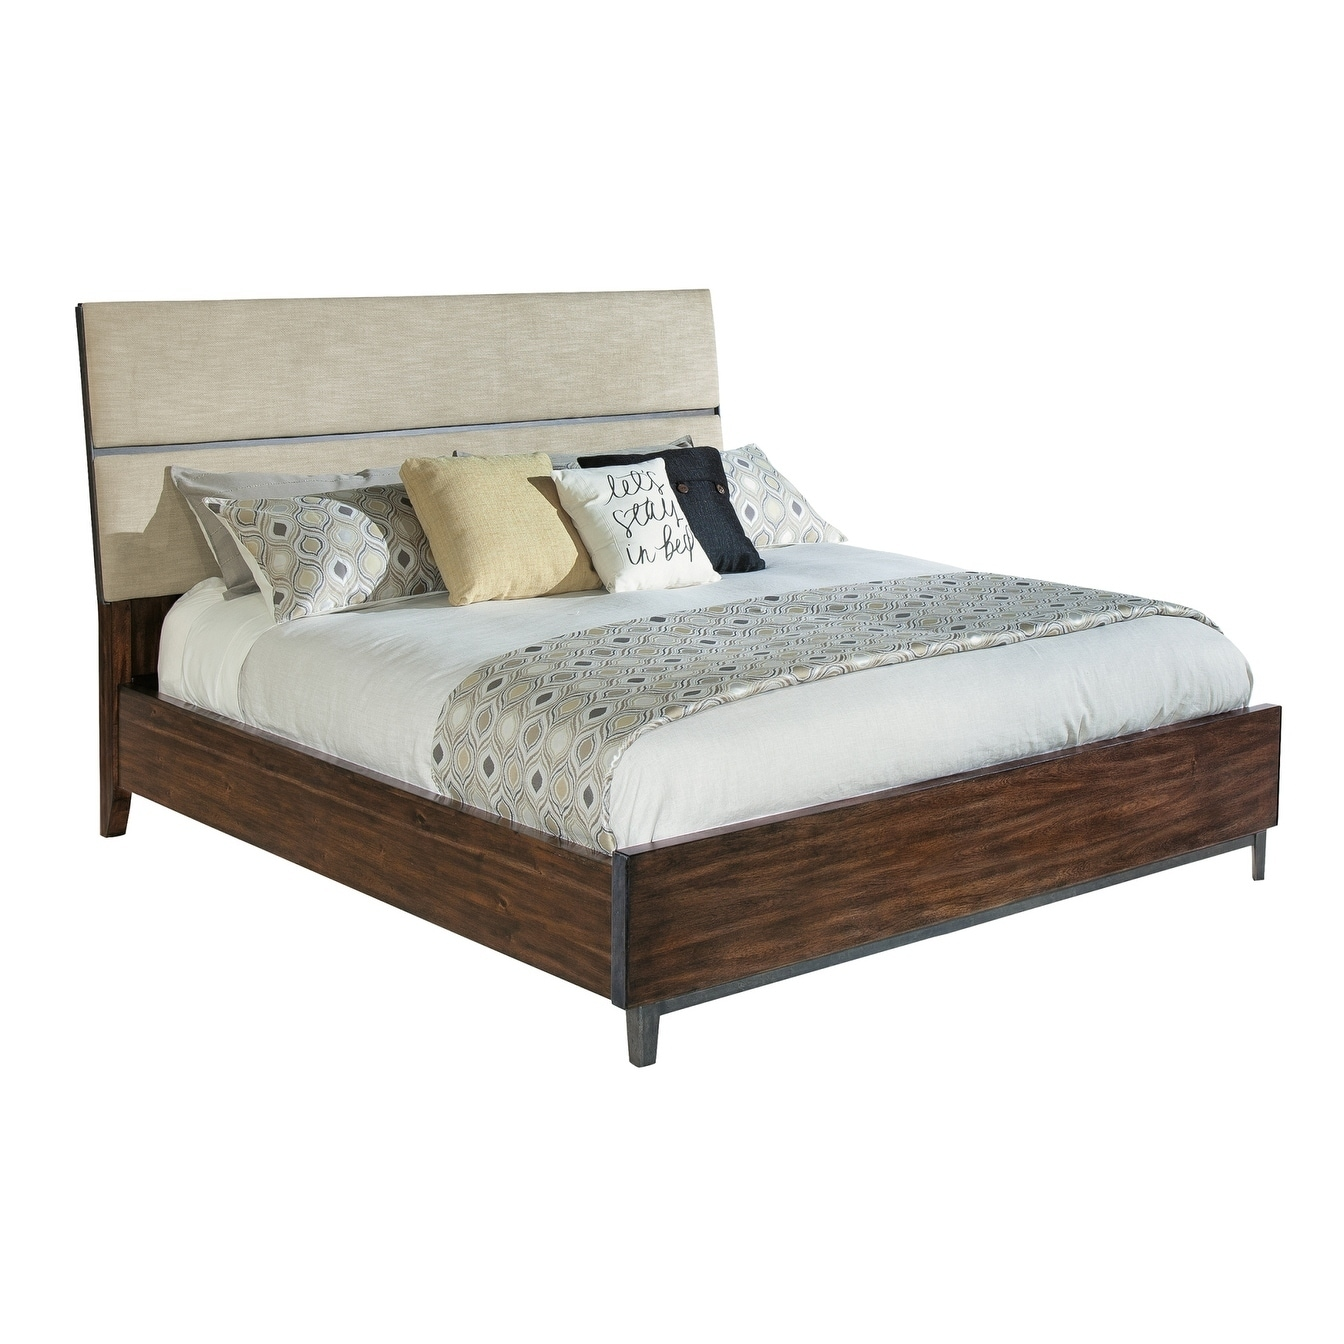 Shop Hekman Furniture Monterey Point Modern Coastal King Upholstered Panel Bed Frame With Headboard Footboard Overstock 24230248